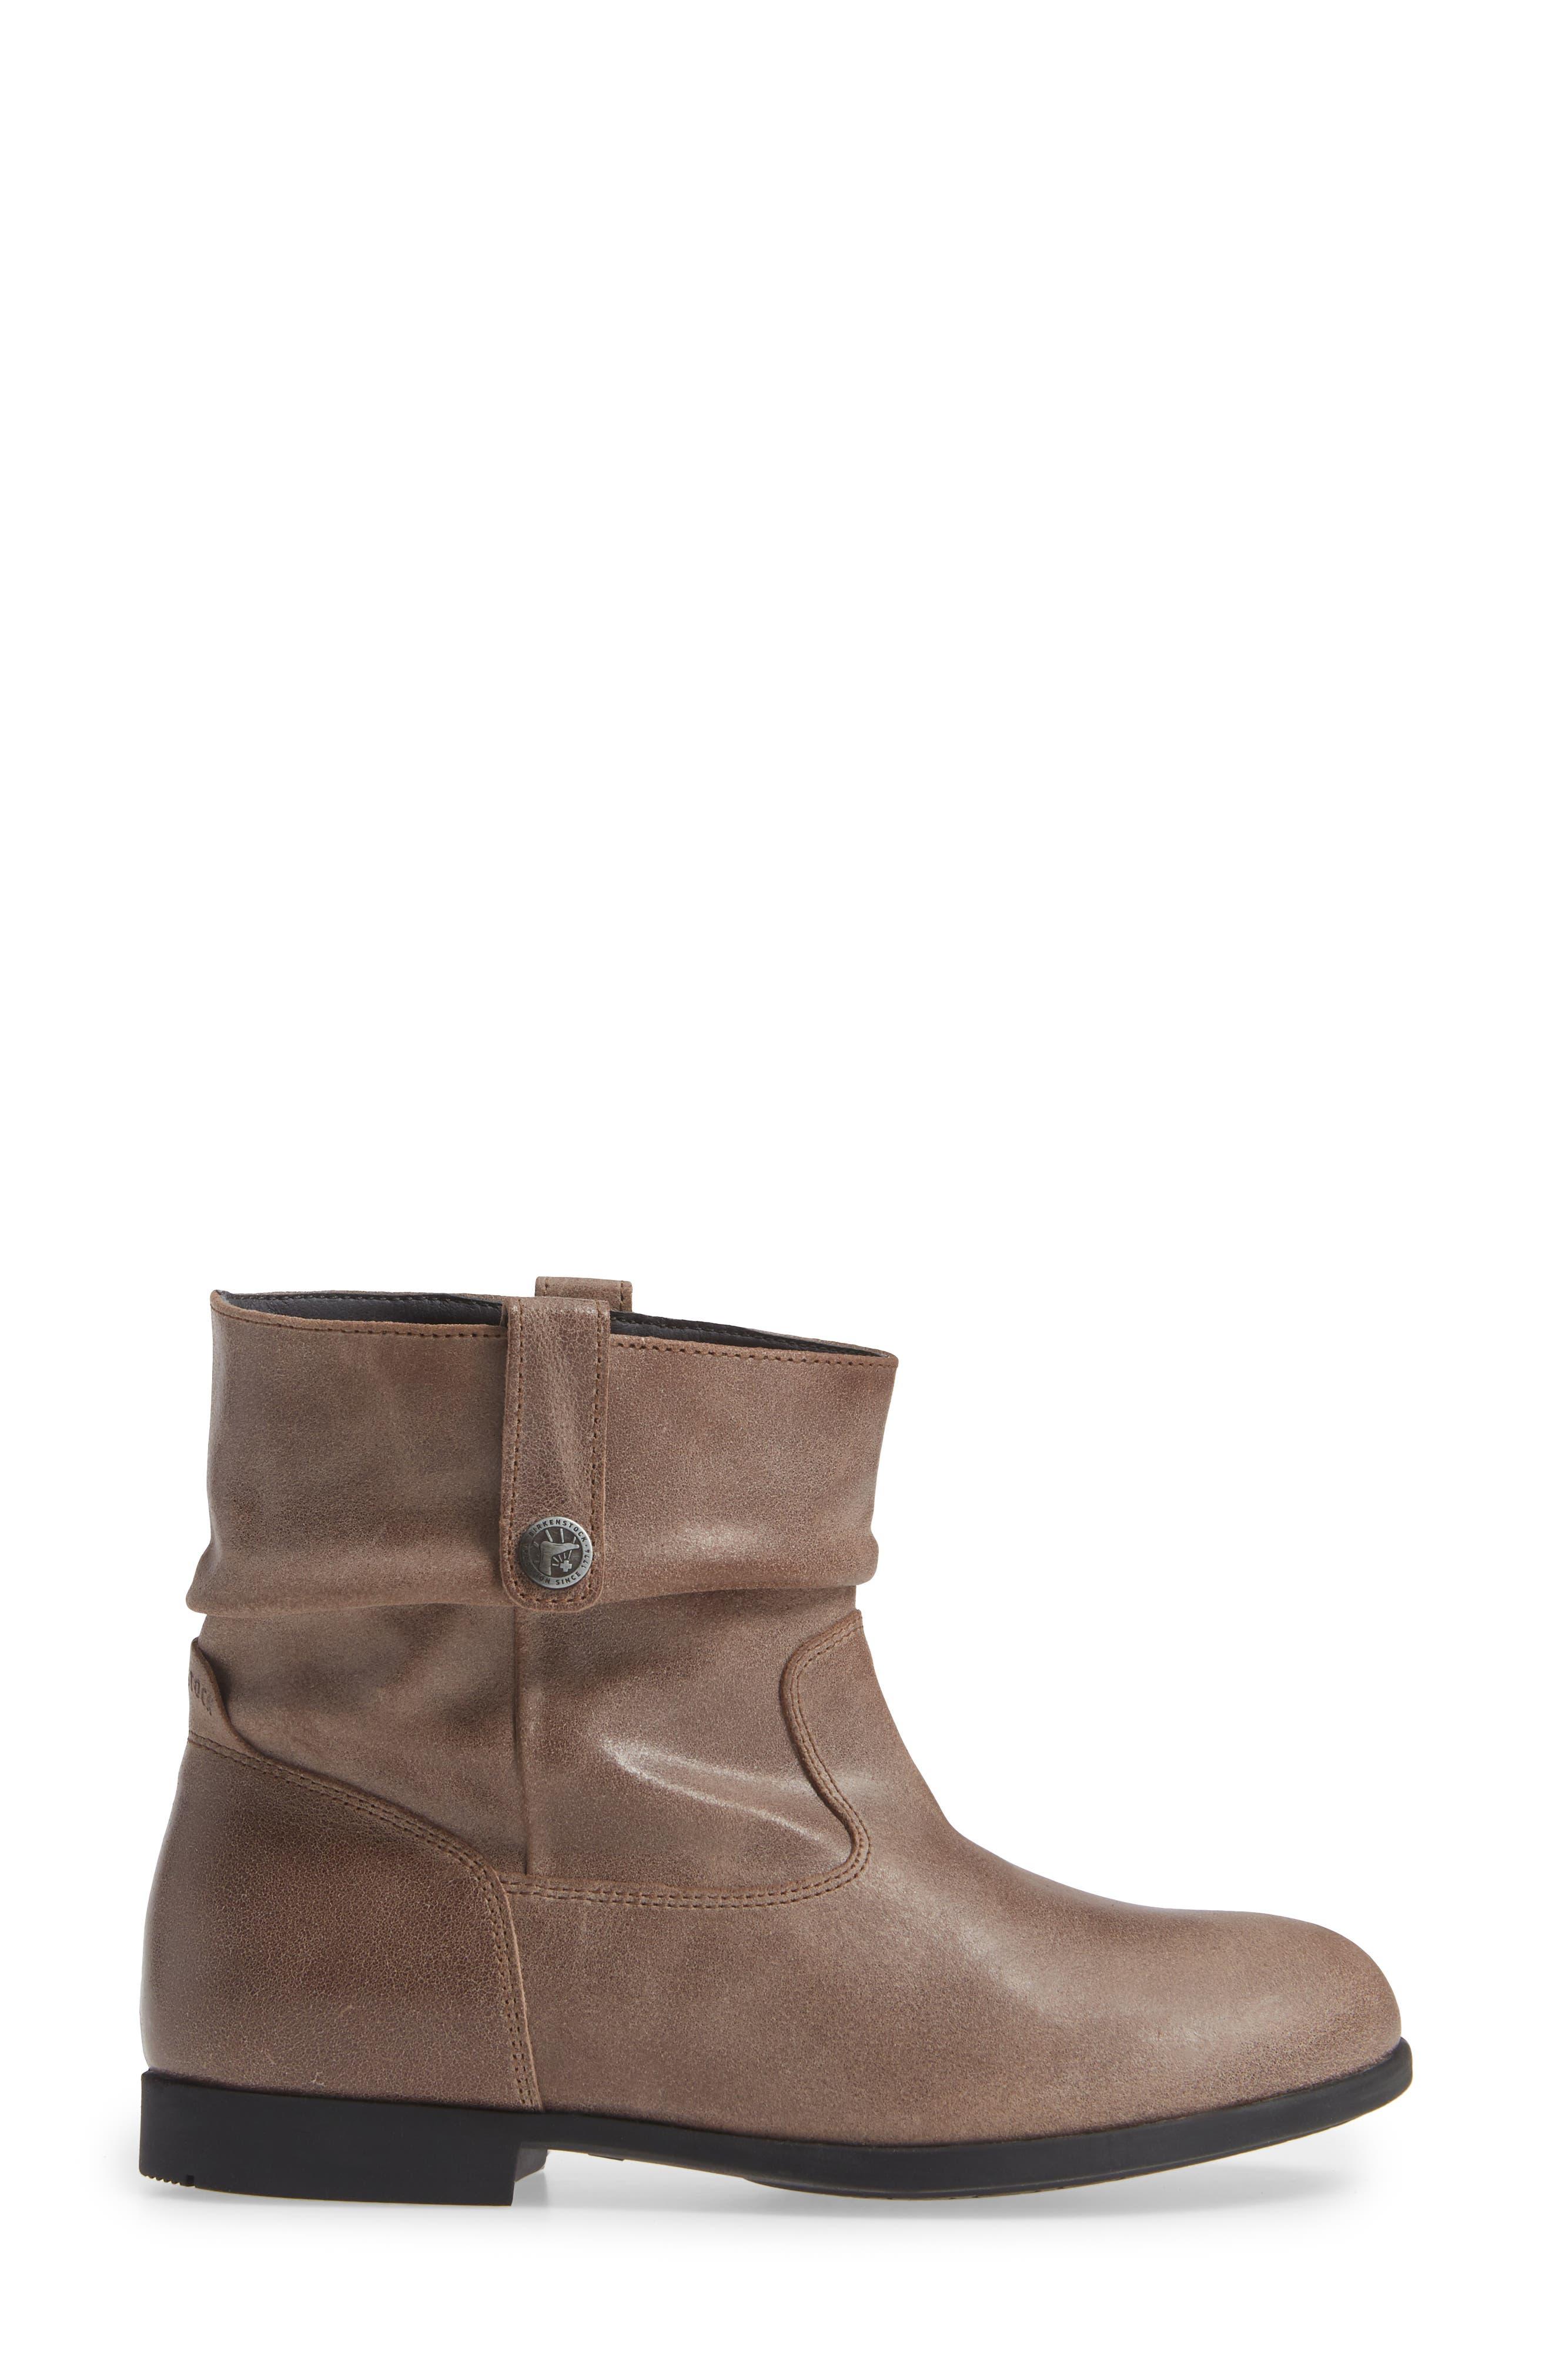 'Sarnia' Boot,                             Alternate thumbnail 3, color,                             MUD SUEDE